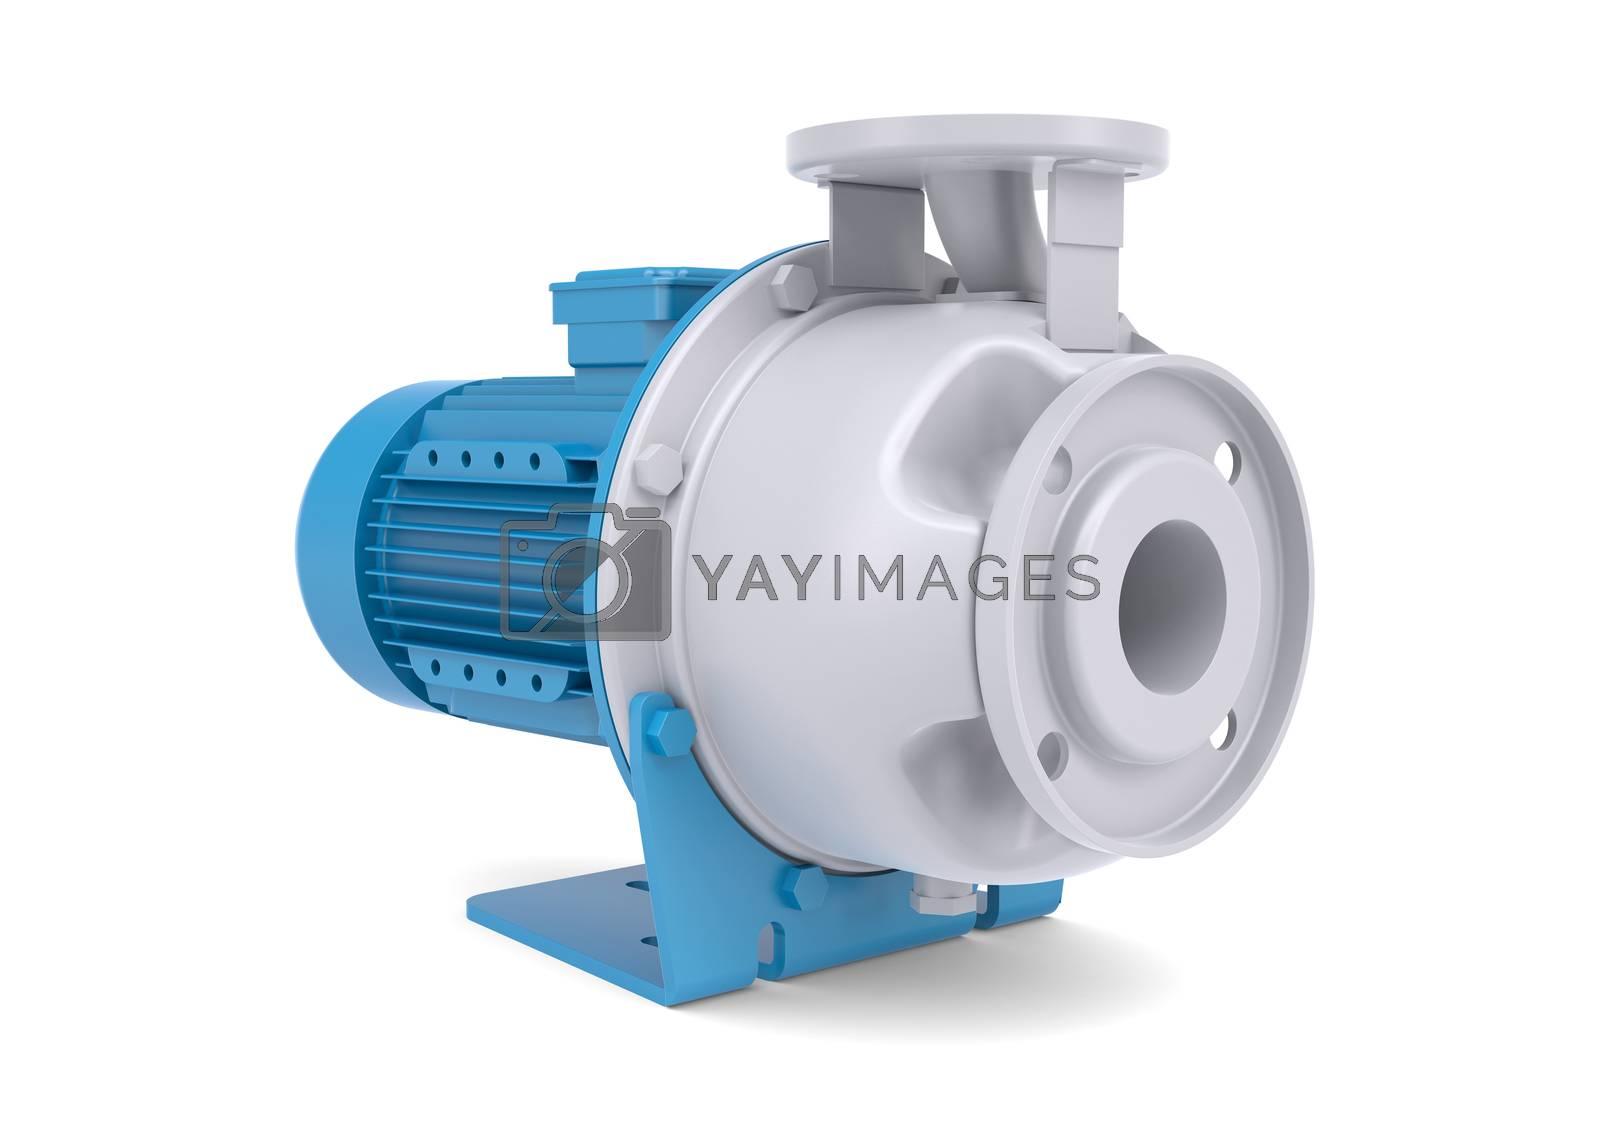 Royalty free image of Water pump motor by cherezoff